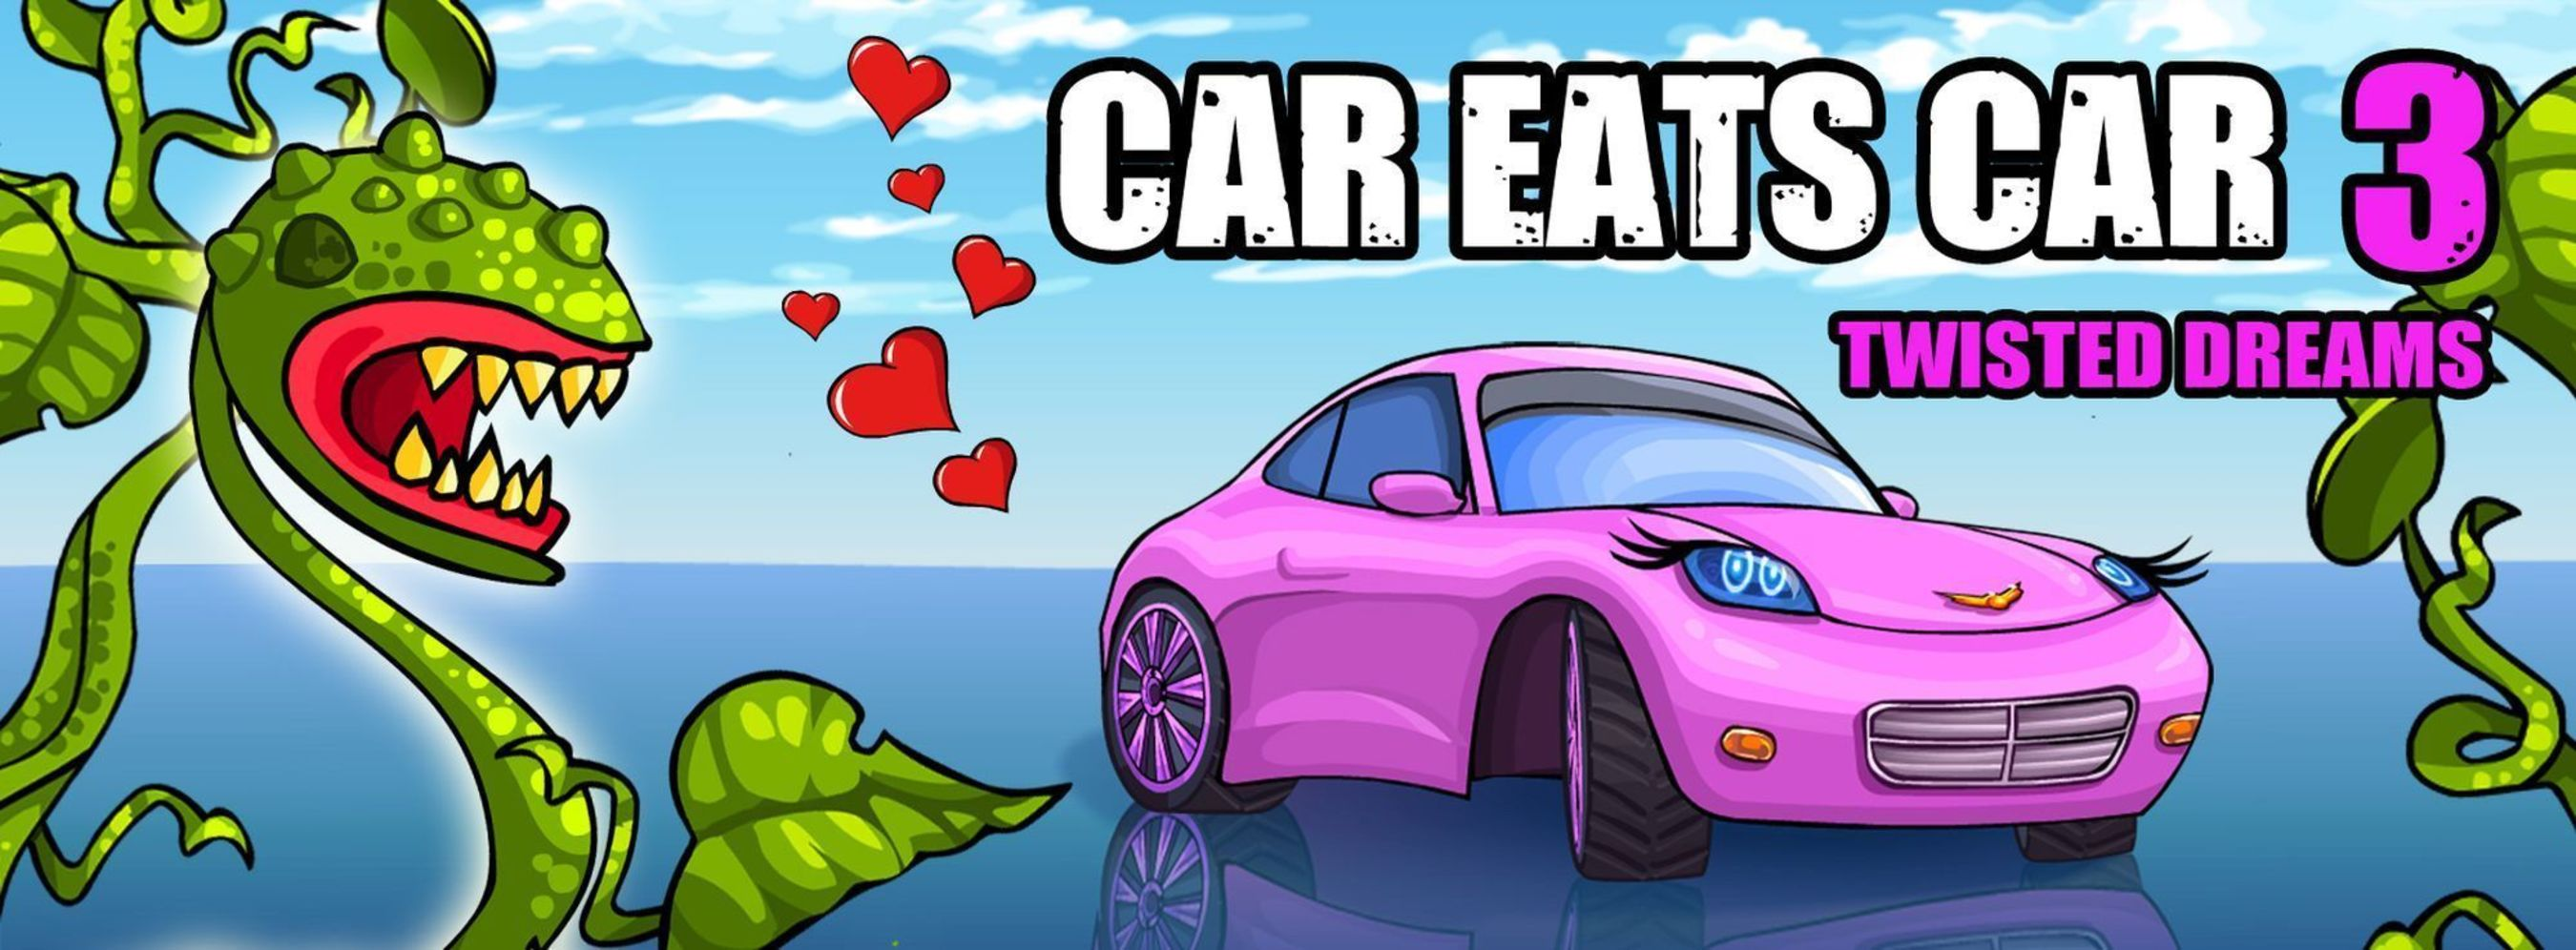 Car Eats Car 3 - online game for PC (PRNewsFoto/MyRealGames_com)